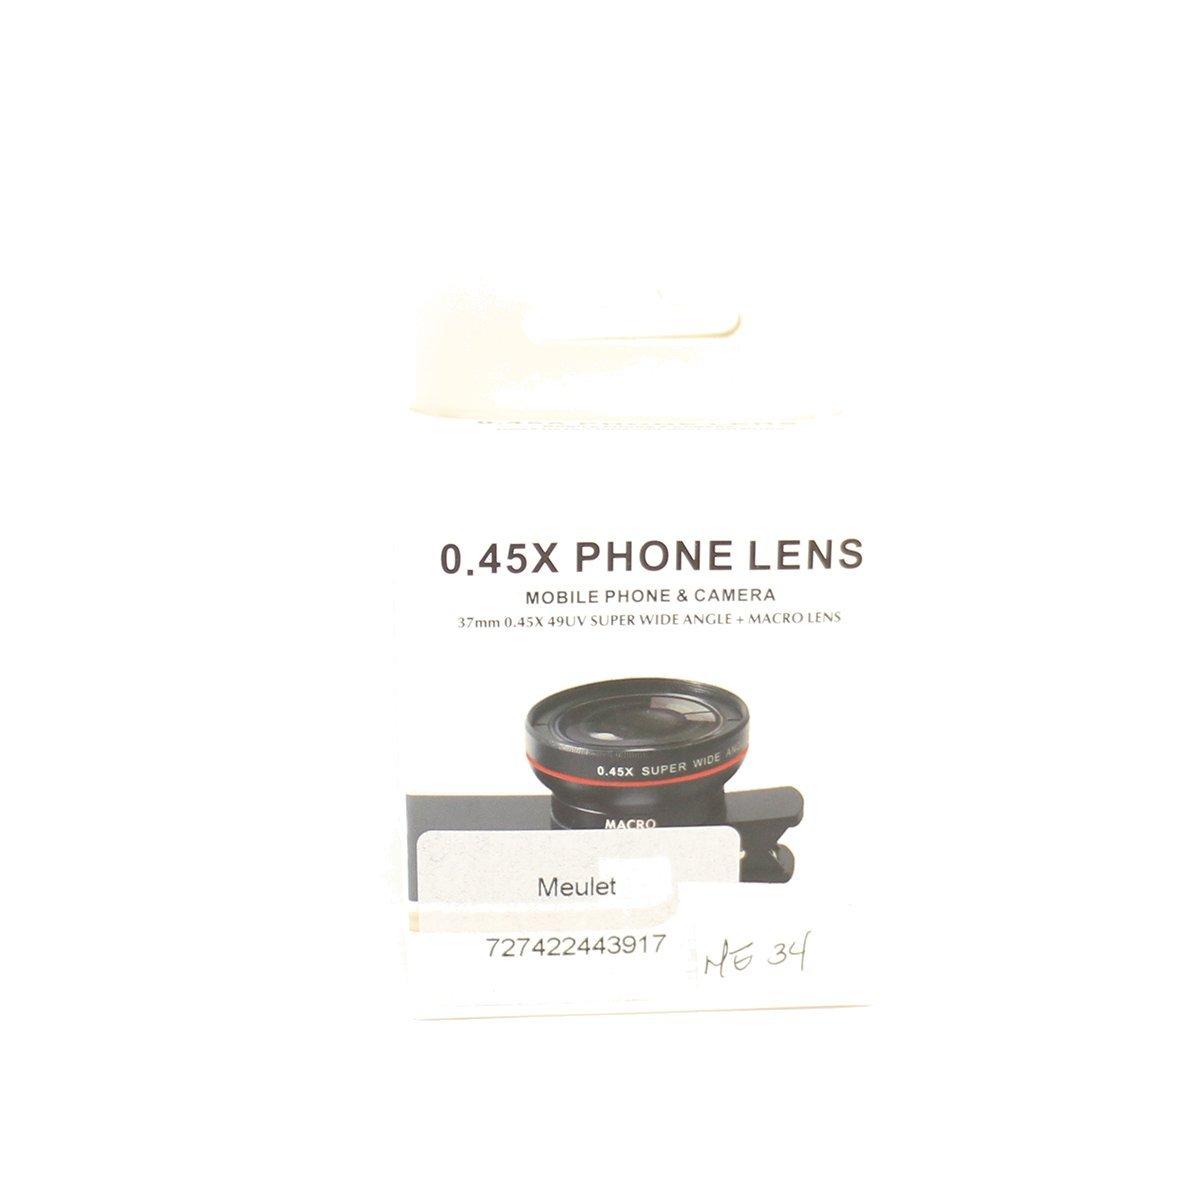 Mobile Phone & Camera 37mm HD Phone lens 0.45 X 49UV Super Wide Angle + 12.5X Macro Lens Black Color Meulet